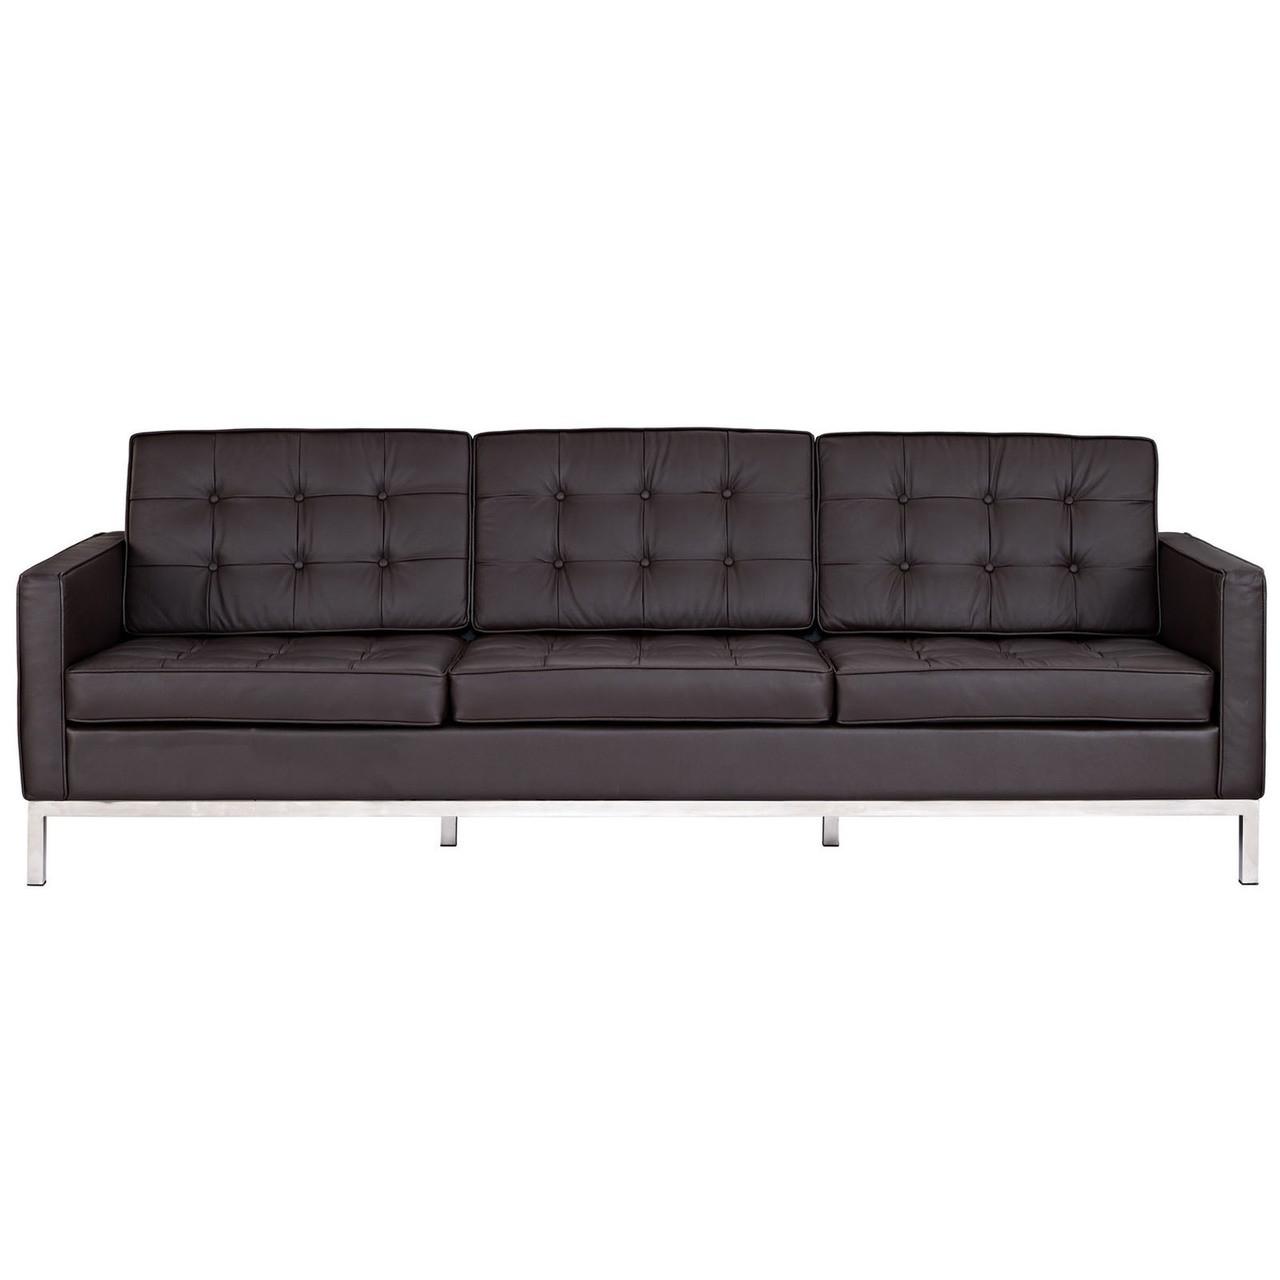 florence style leather loft sofa zin home. Black Bedroom Furniture Sets. Home Design Ideas